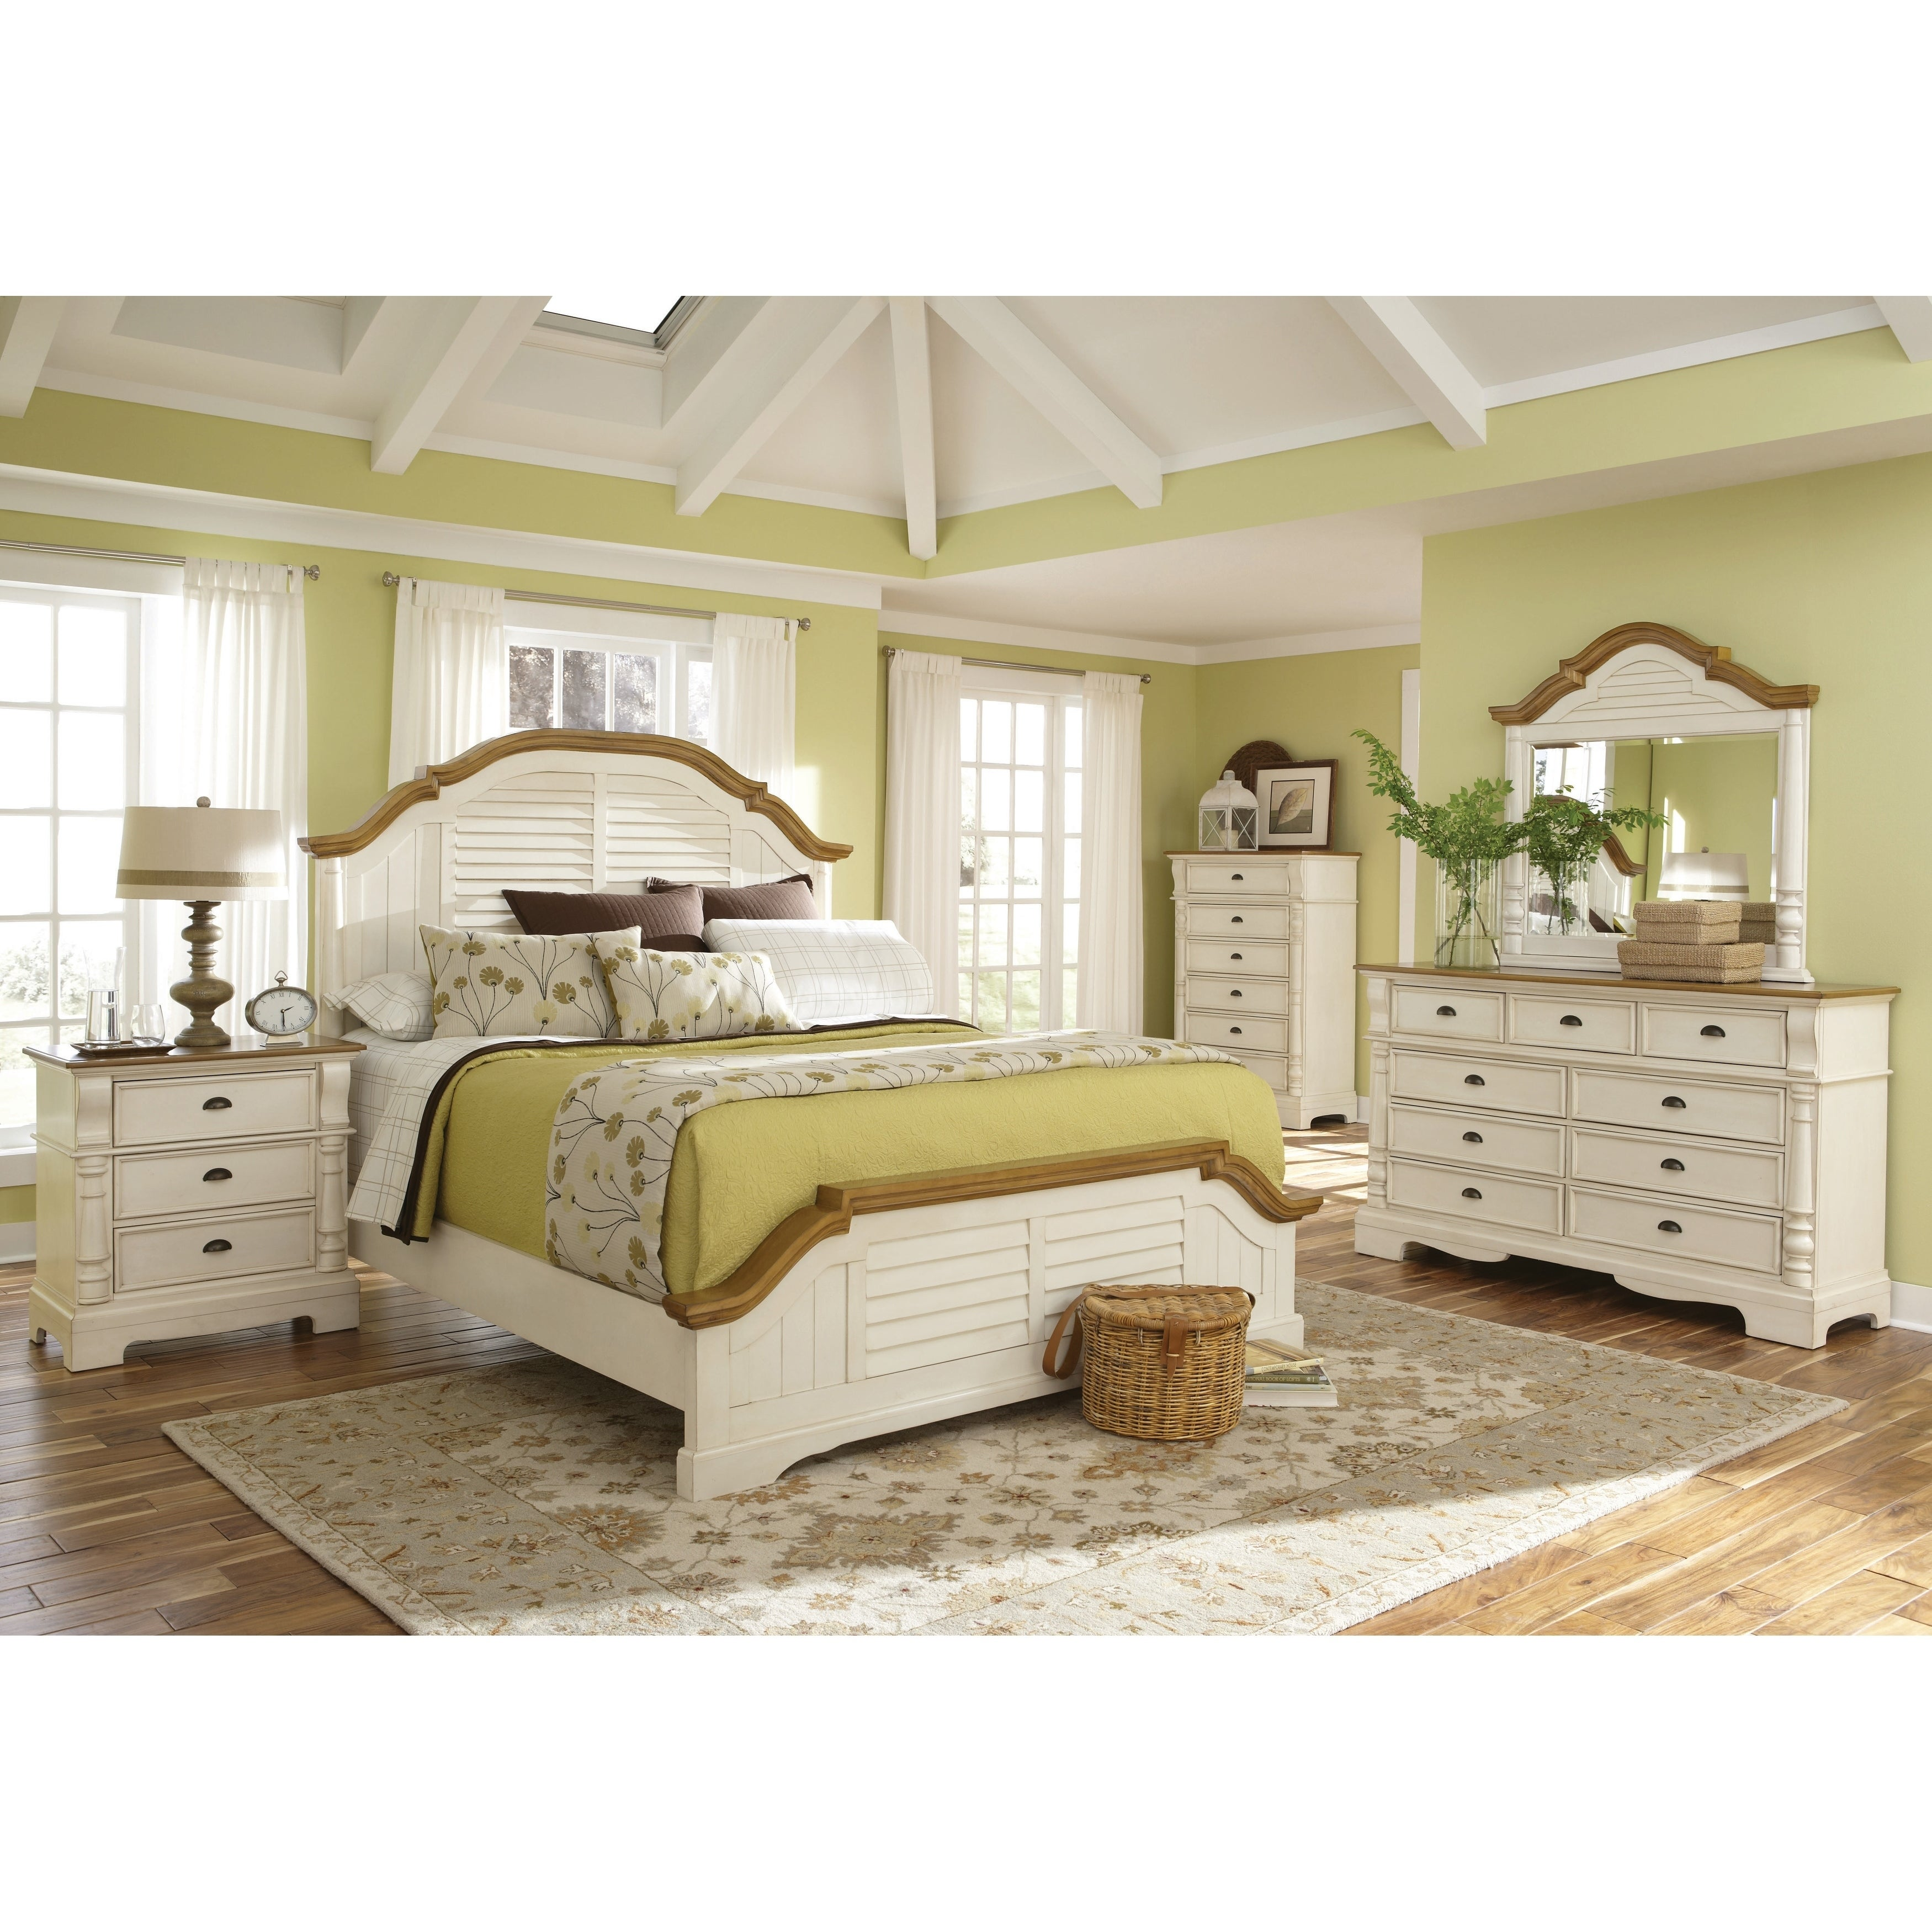 Oleta Cottage Brown 4-piece Bedroom Set